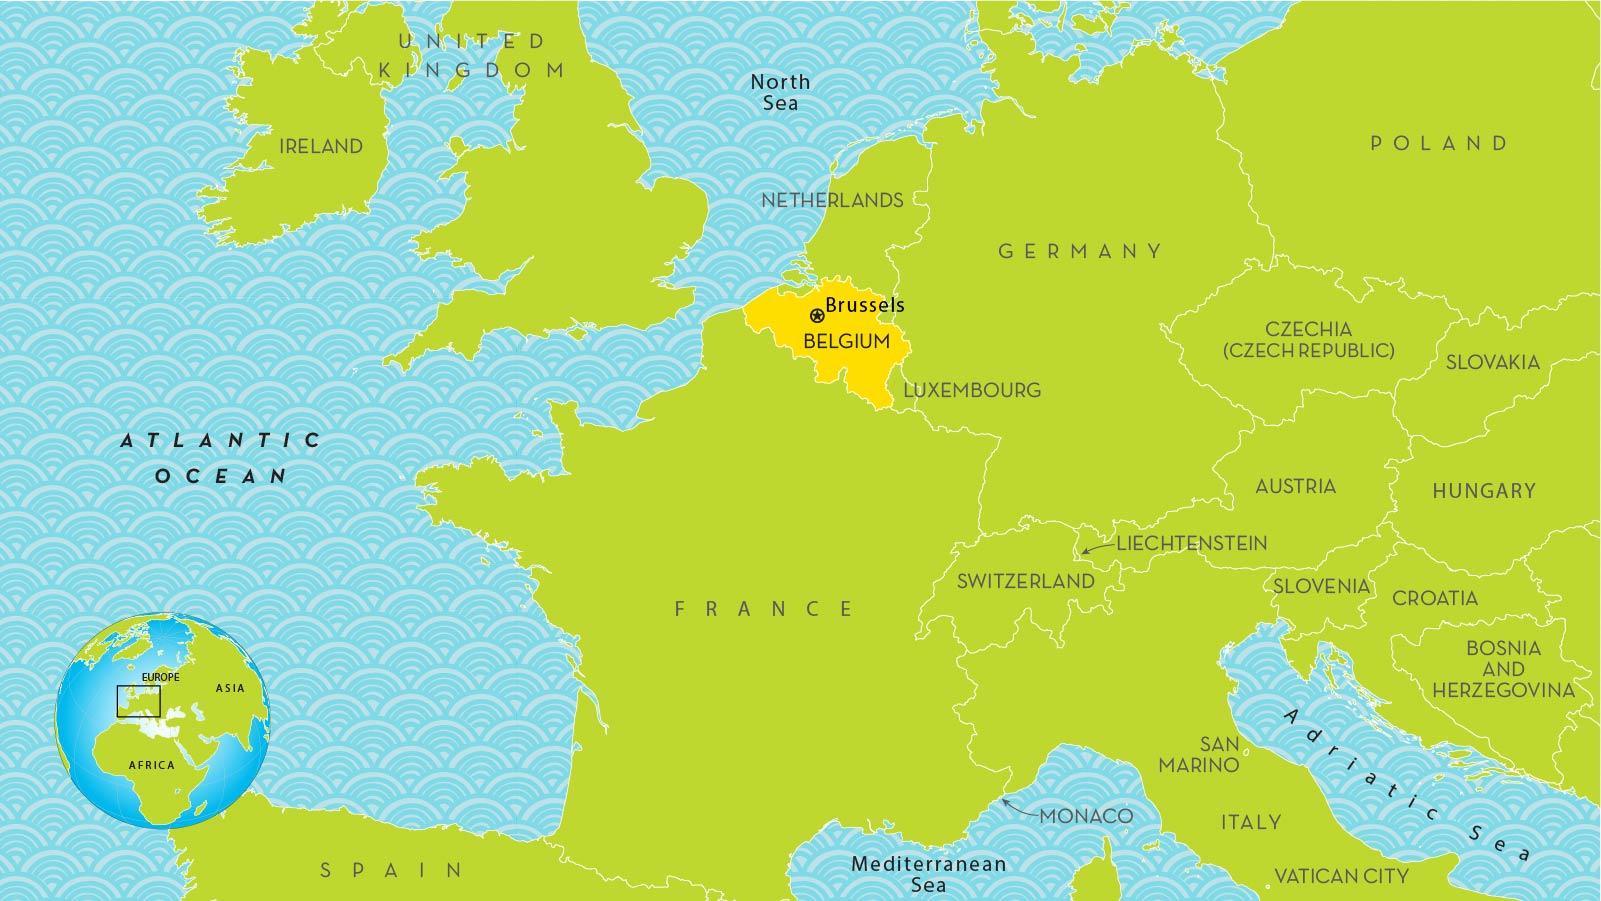 Bryssel Belgia Kartta Euroopan Kartta Brysselin Euroopassa Belgia